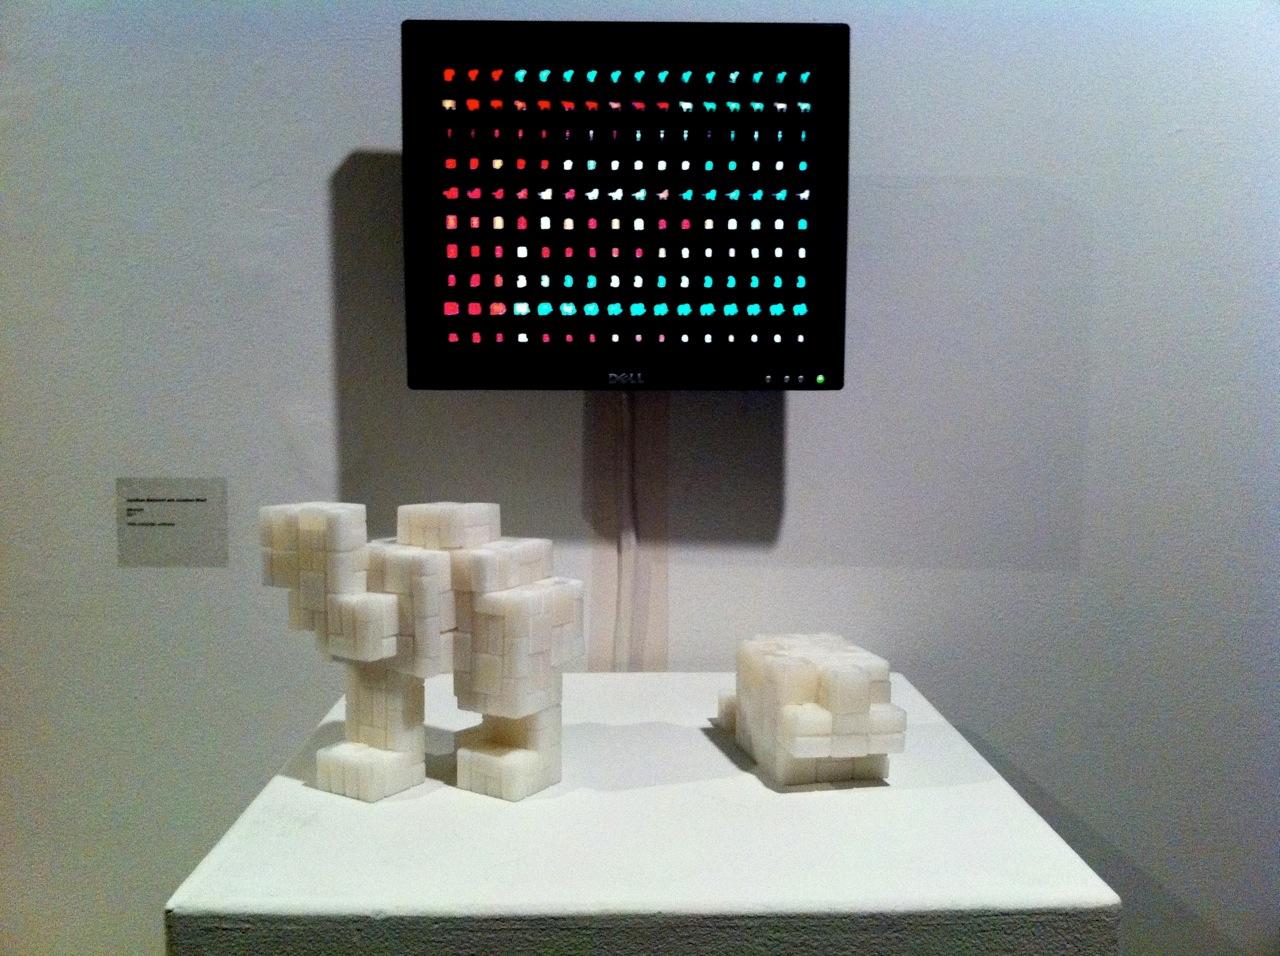 Minimals: Digital Assembly Meets Art